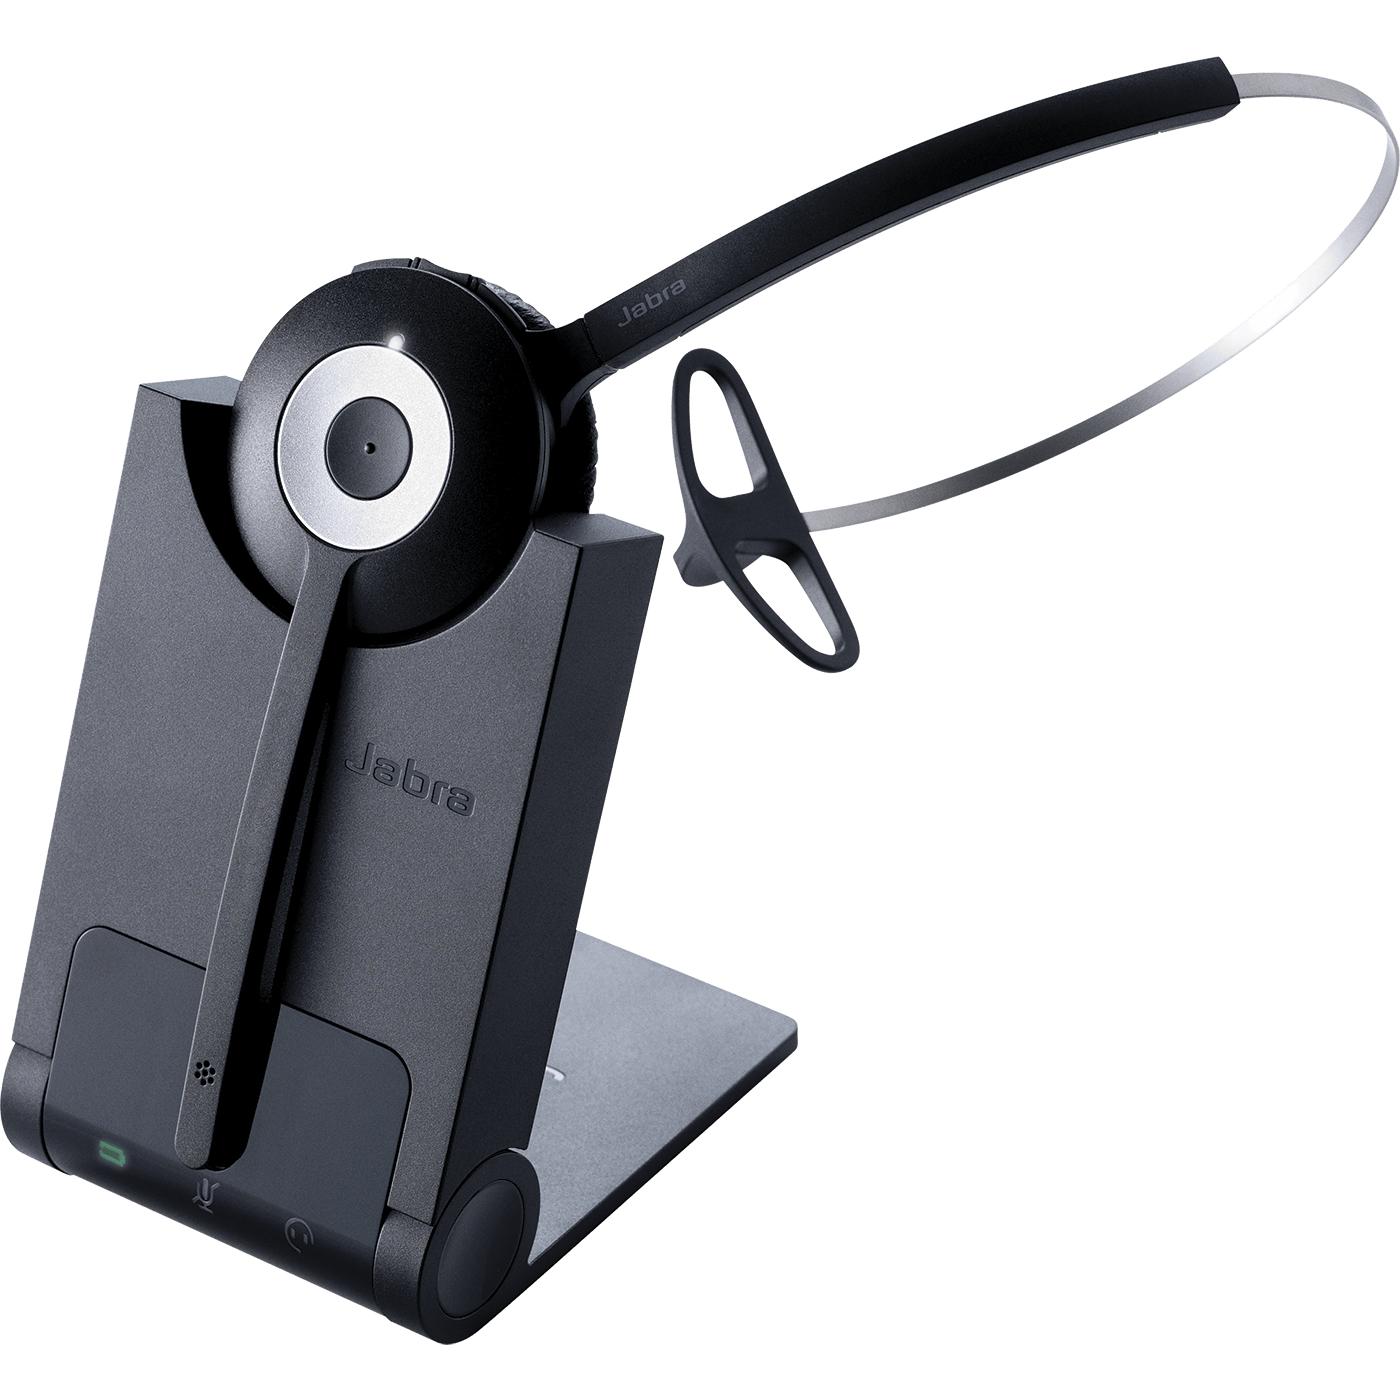 Jabra Pro 920 Headset Head-band Black